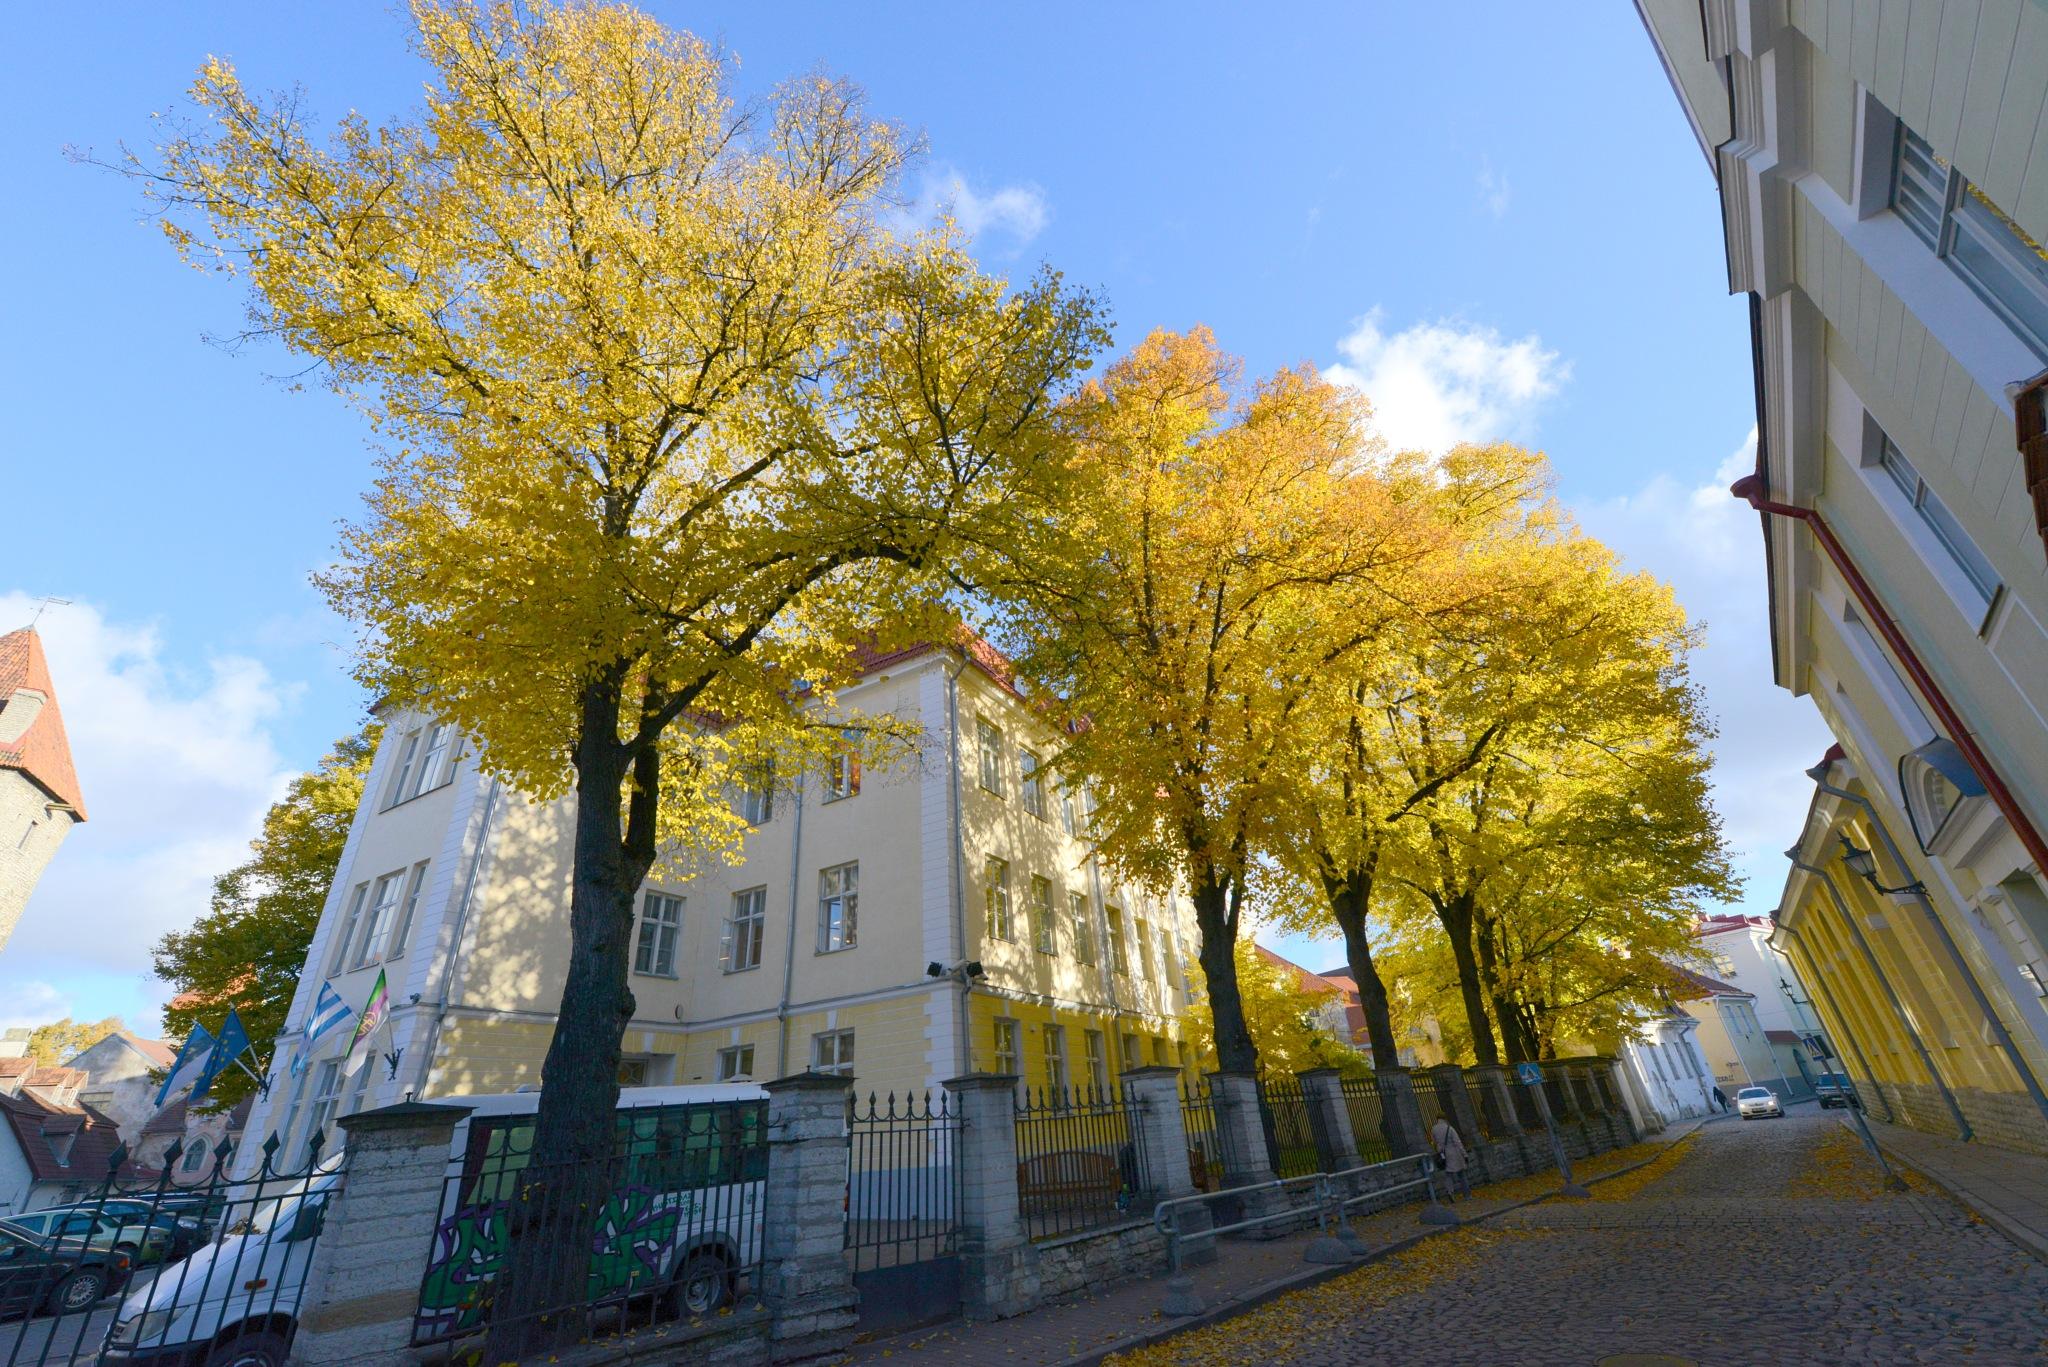 Tallinn, old city by Lasse Tur